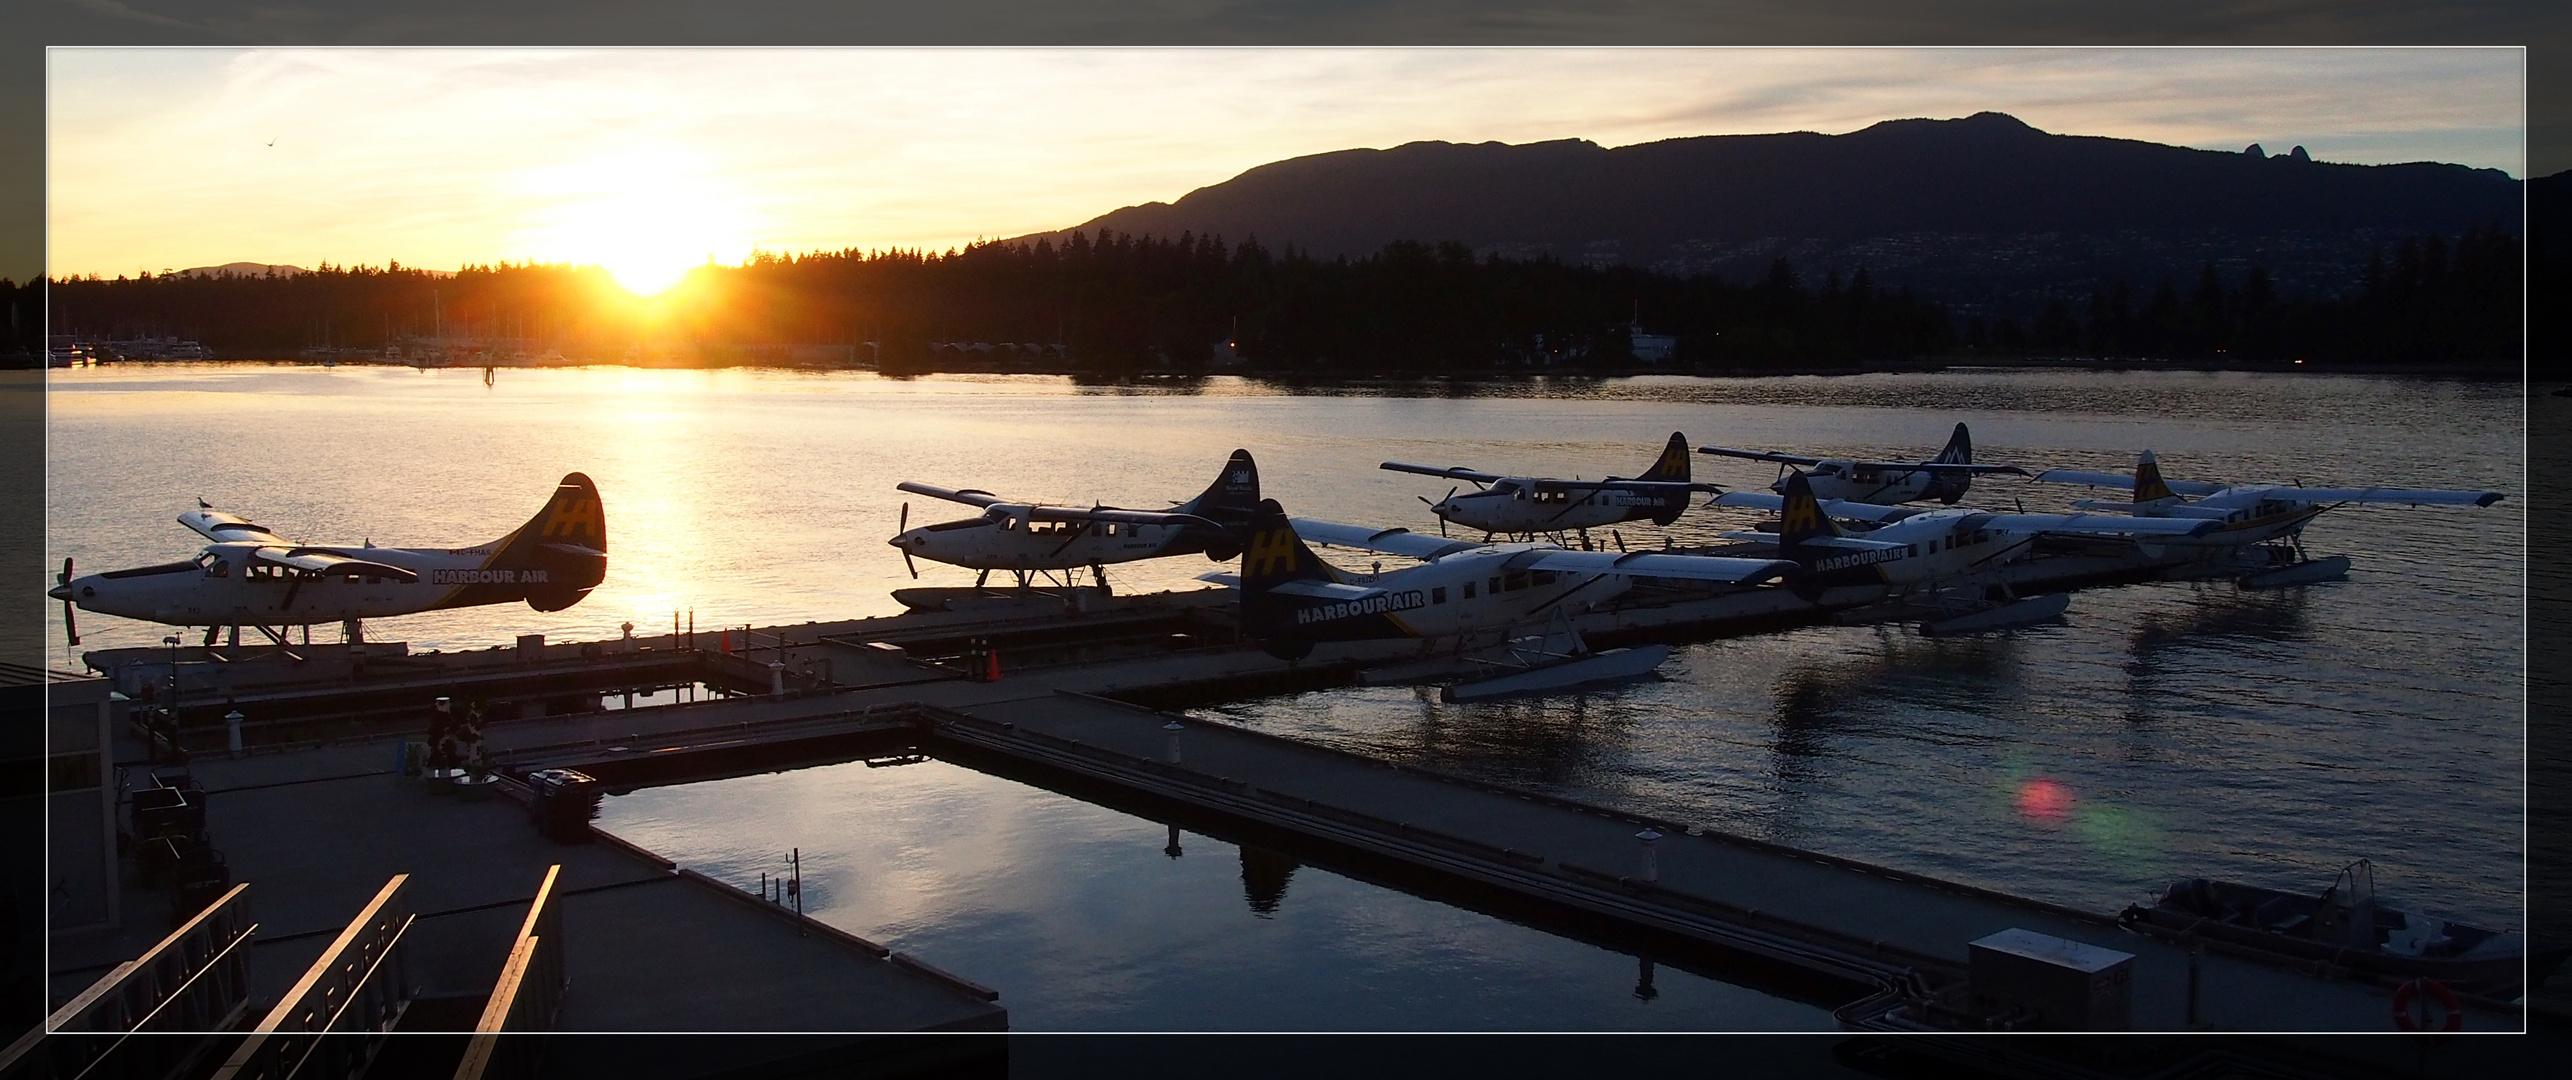 SEA-AIRPORT, Vancouver